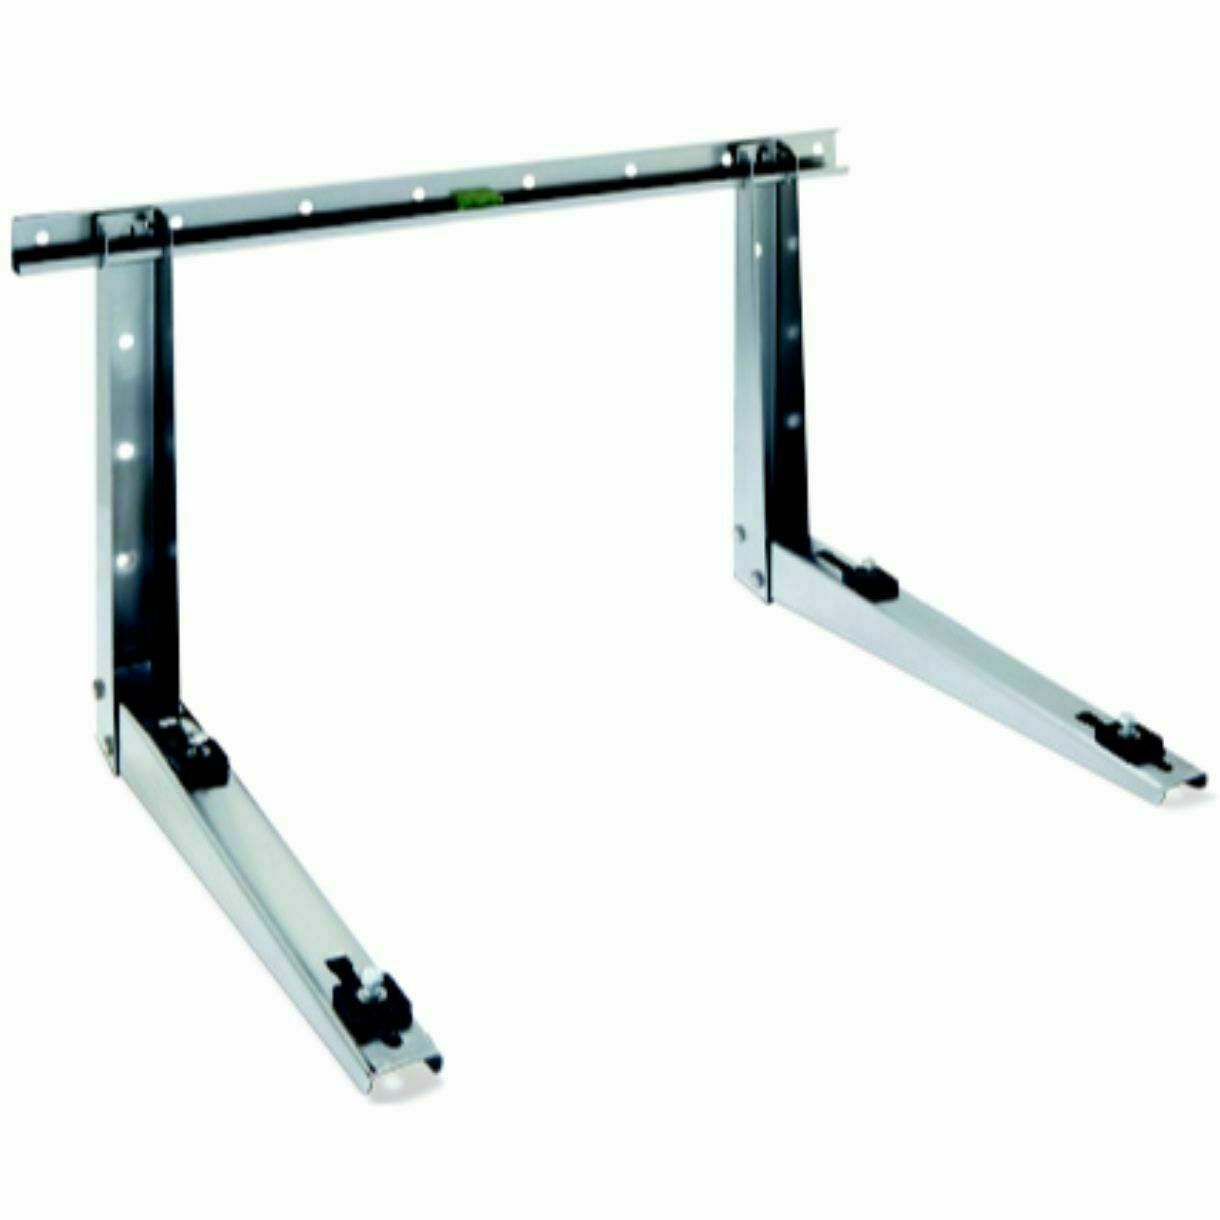 Airtec WBB-300 - Universal Wall Condenser Hanging Bracket Ki